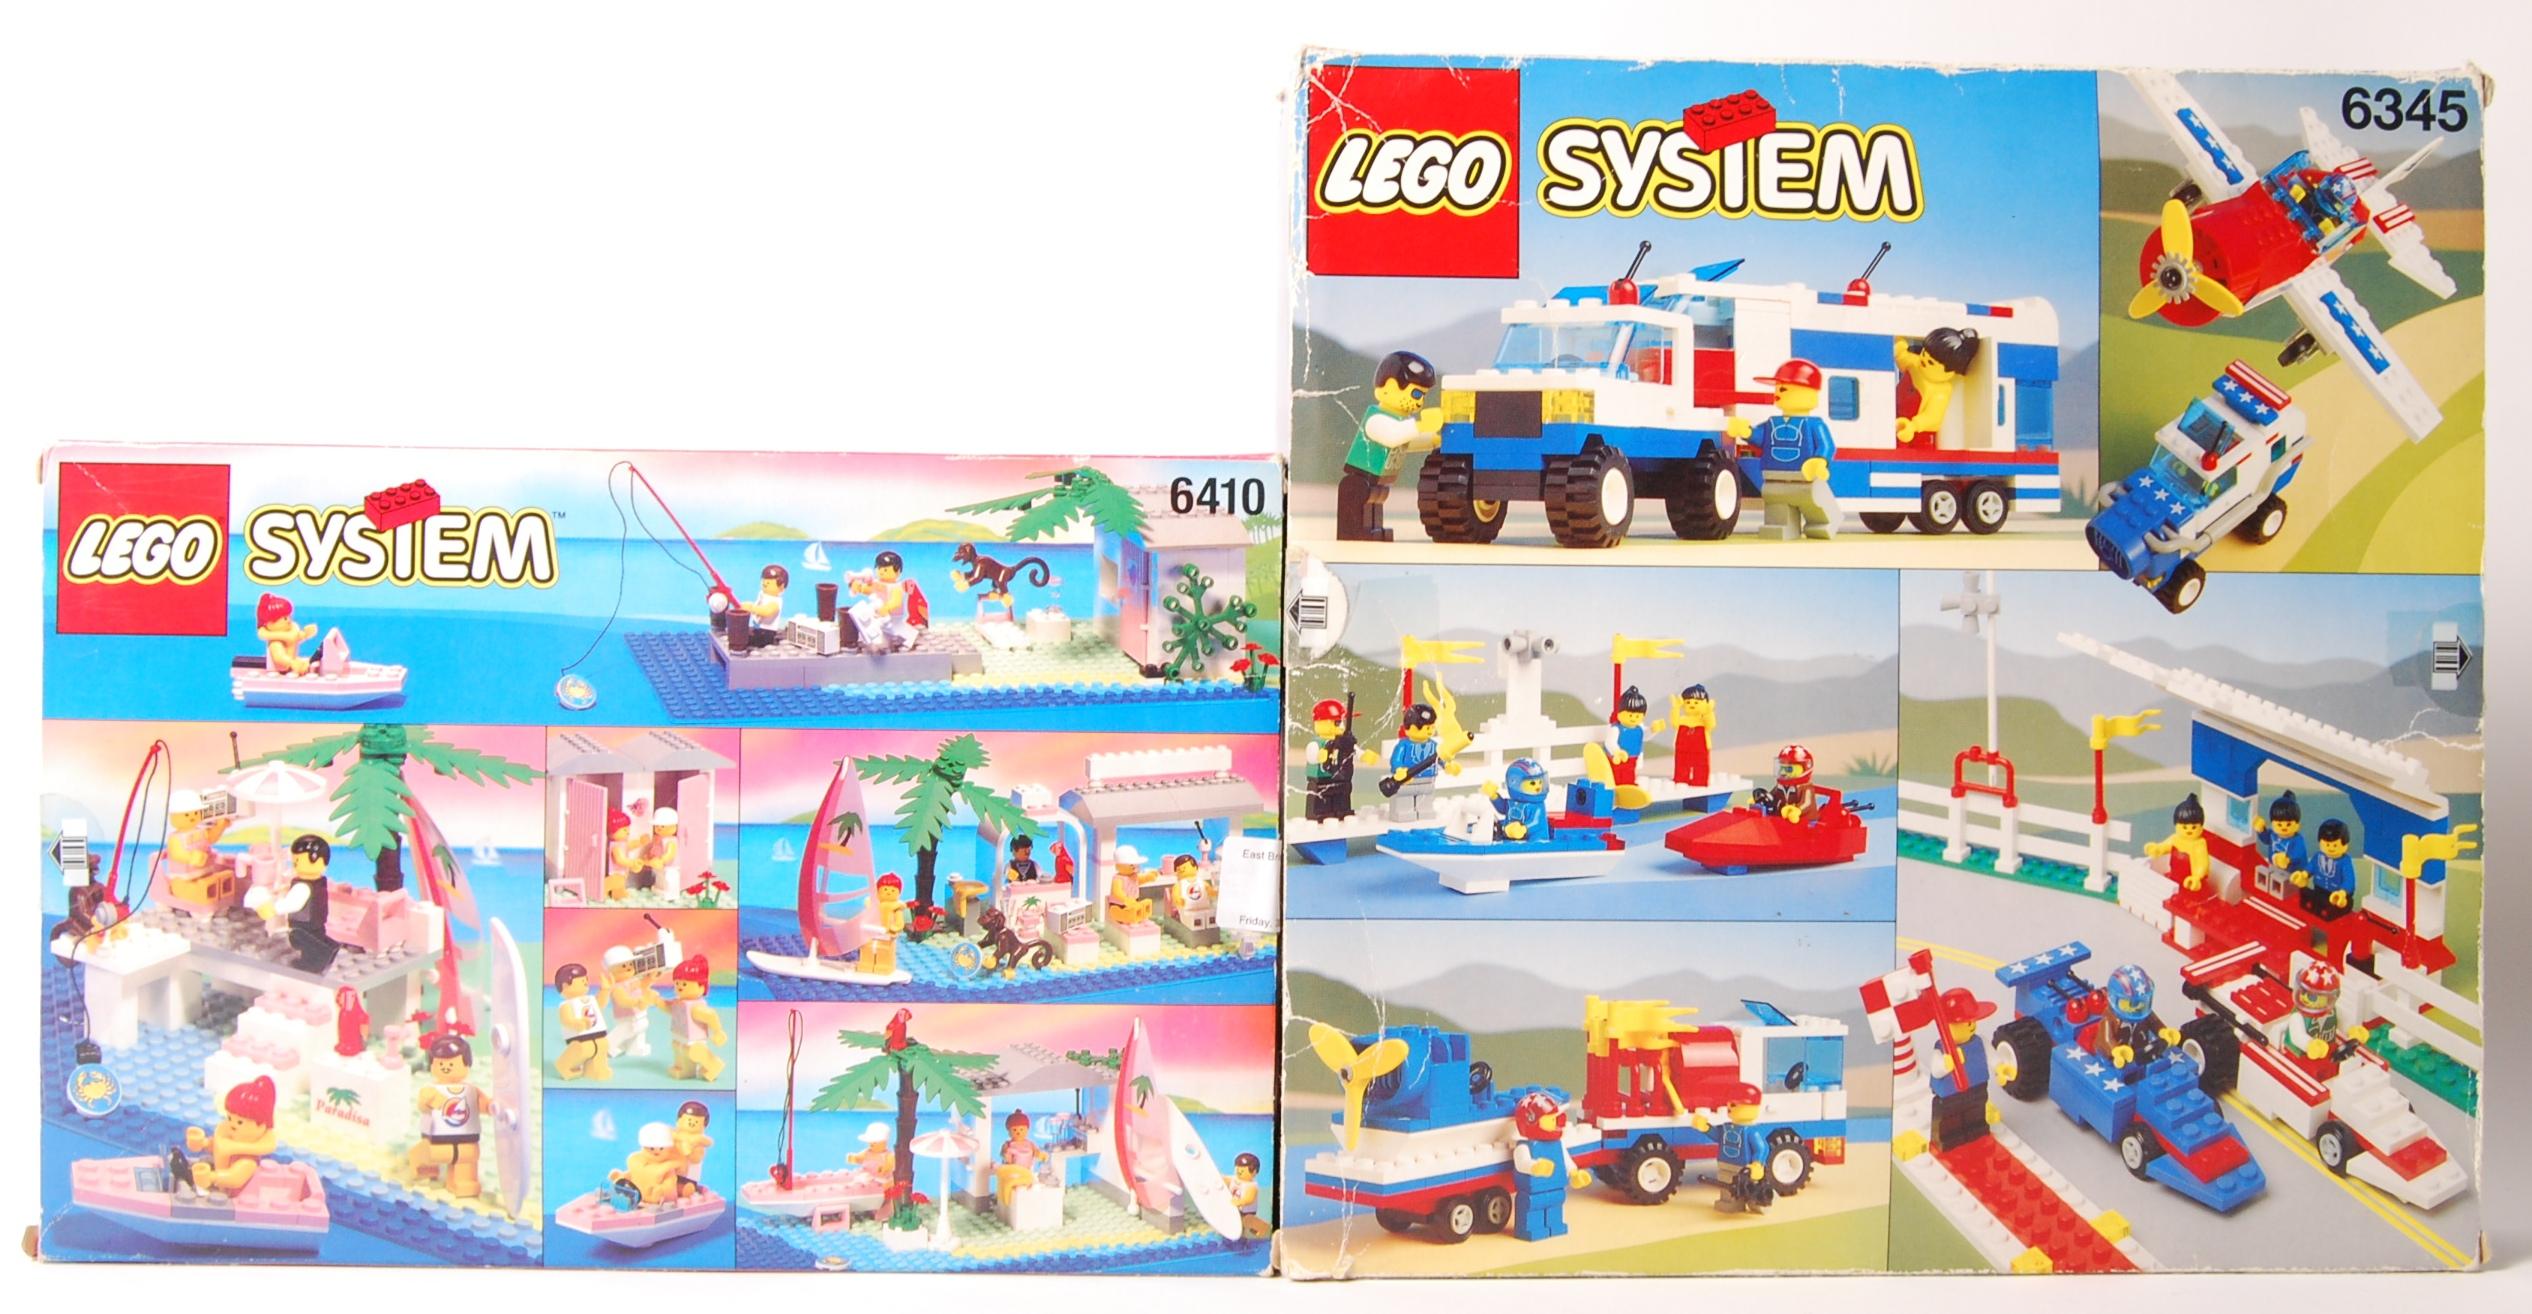 Lot 5 - LEGO SYSTEM SET NO'S. 6345 & 6410